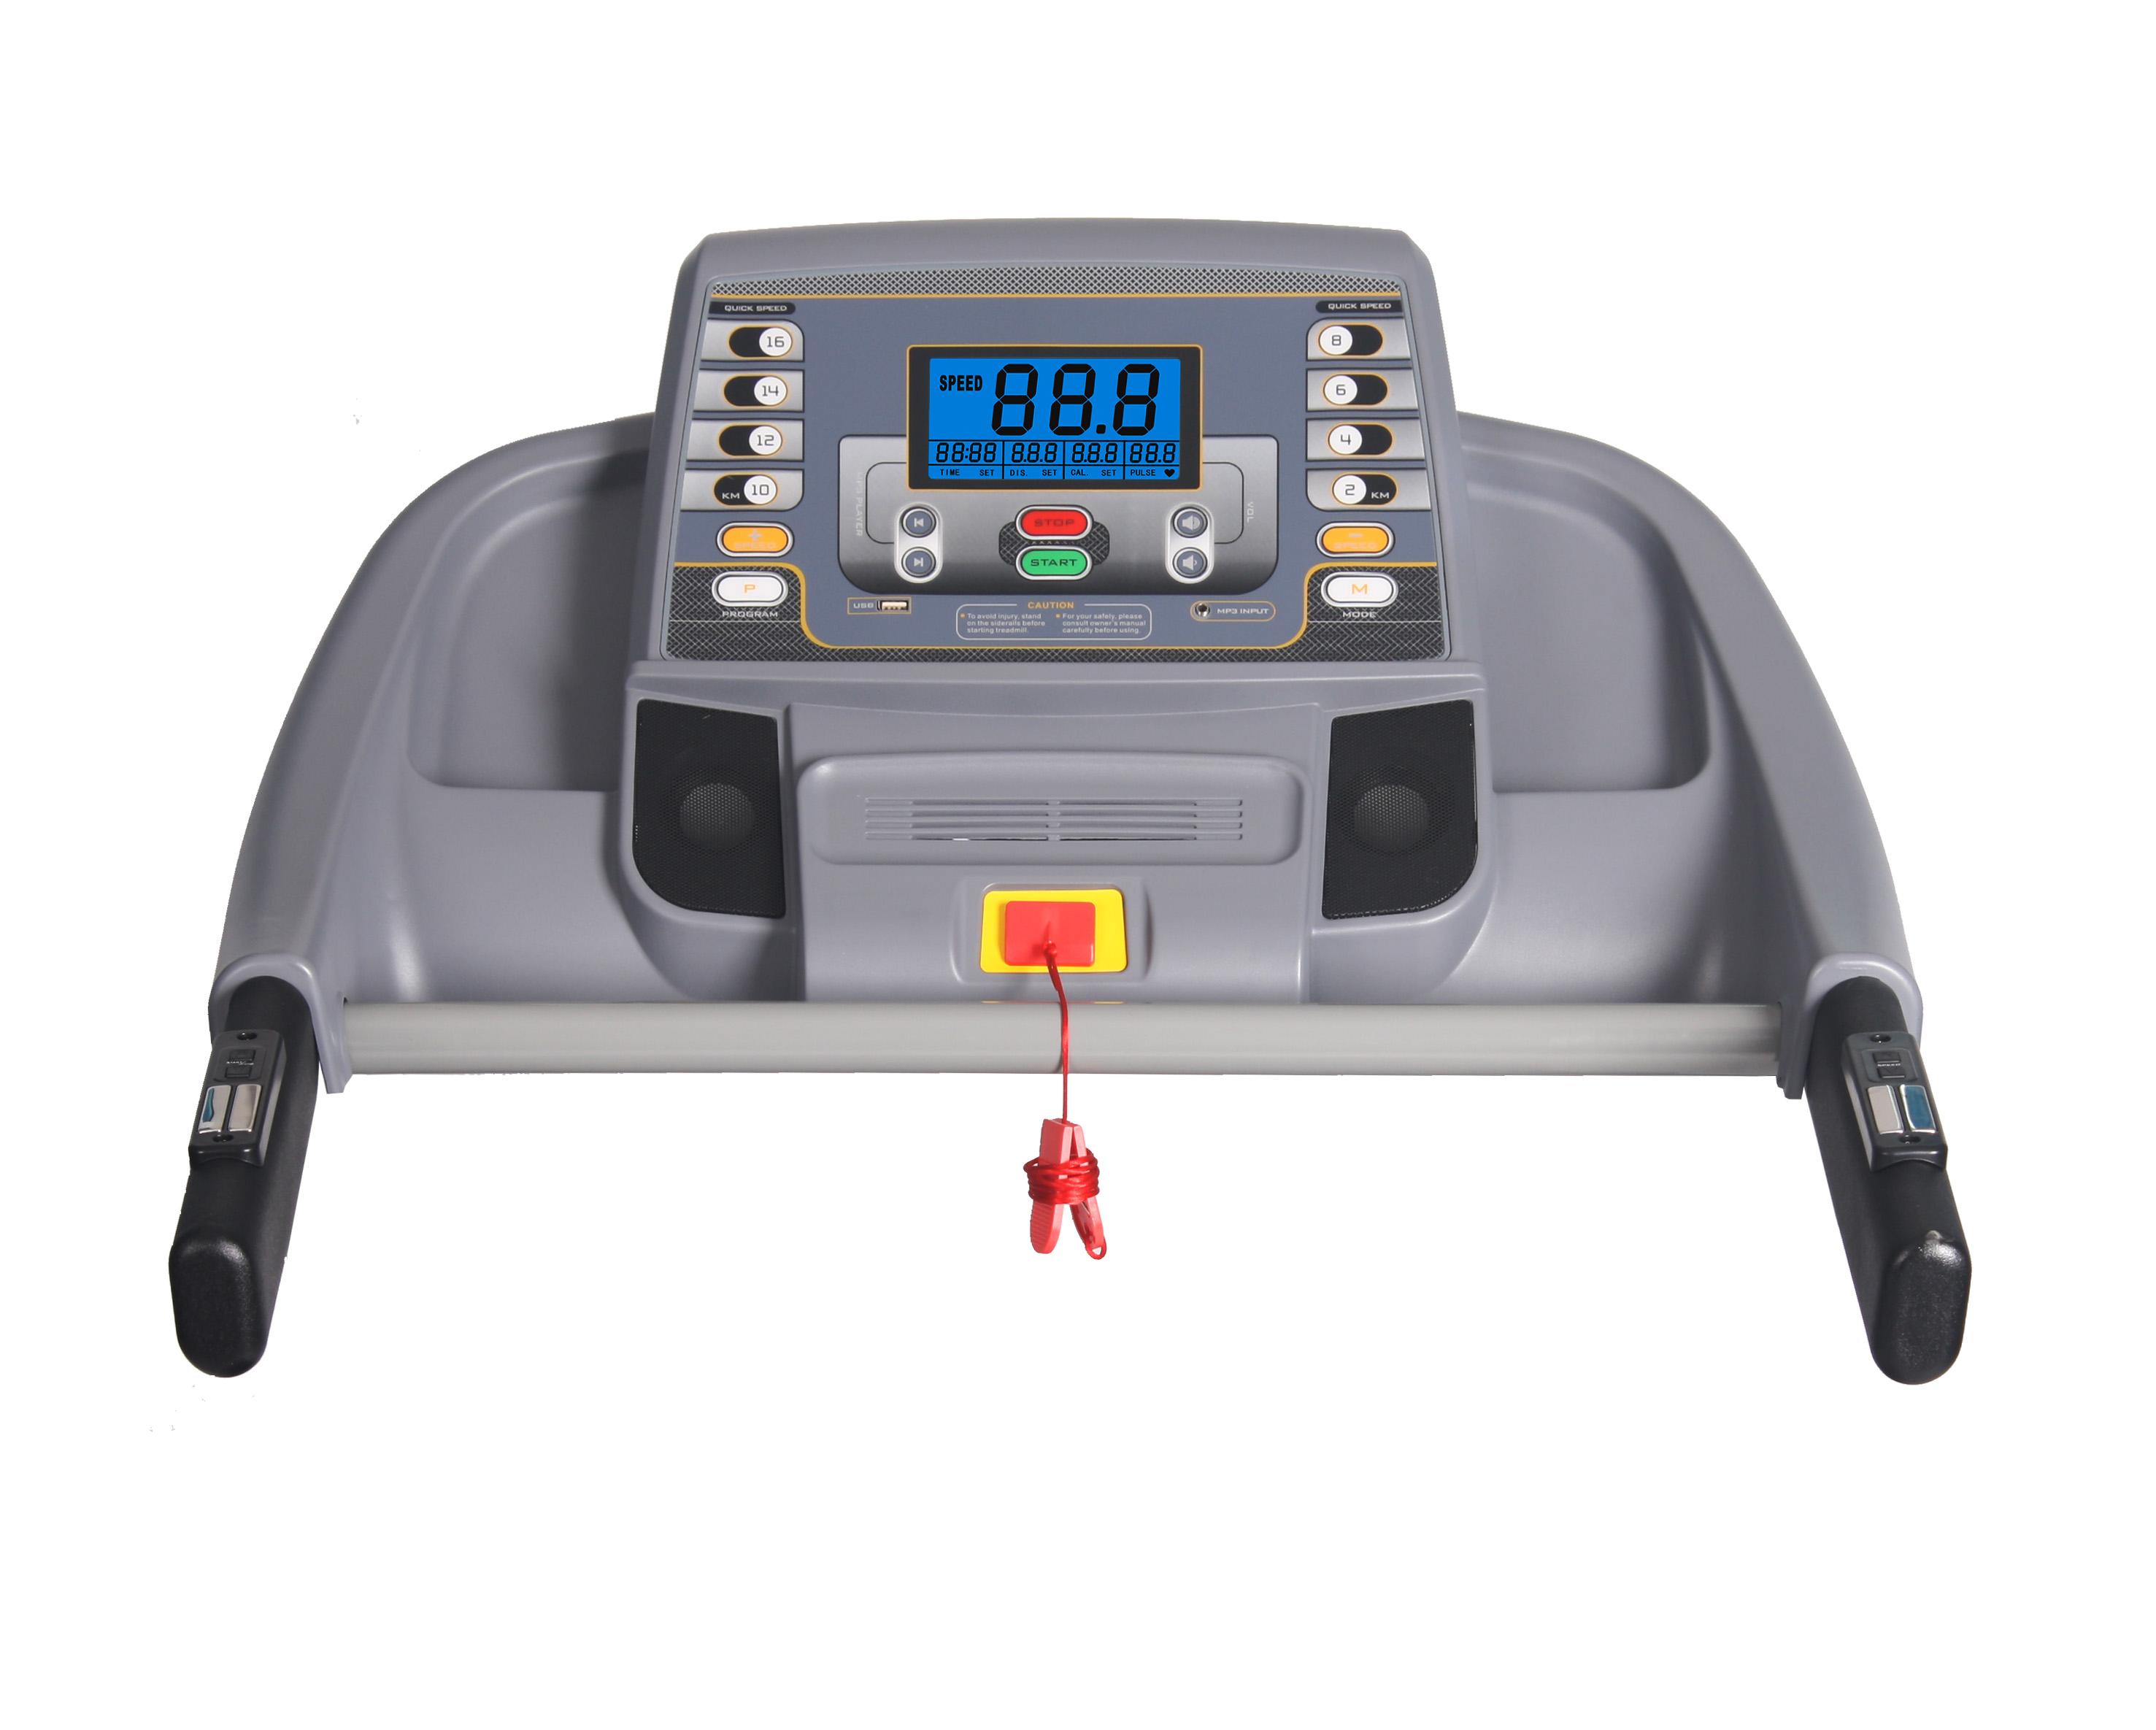 Treadmill Prices Treadmill Fitness Product Srilanka